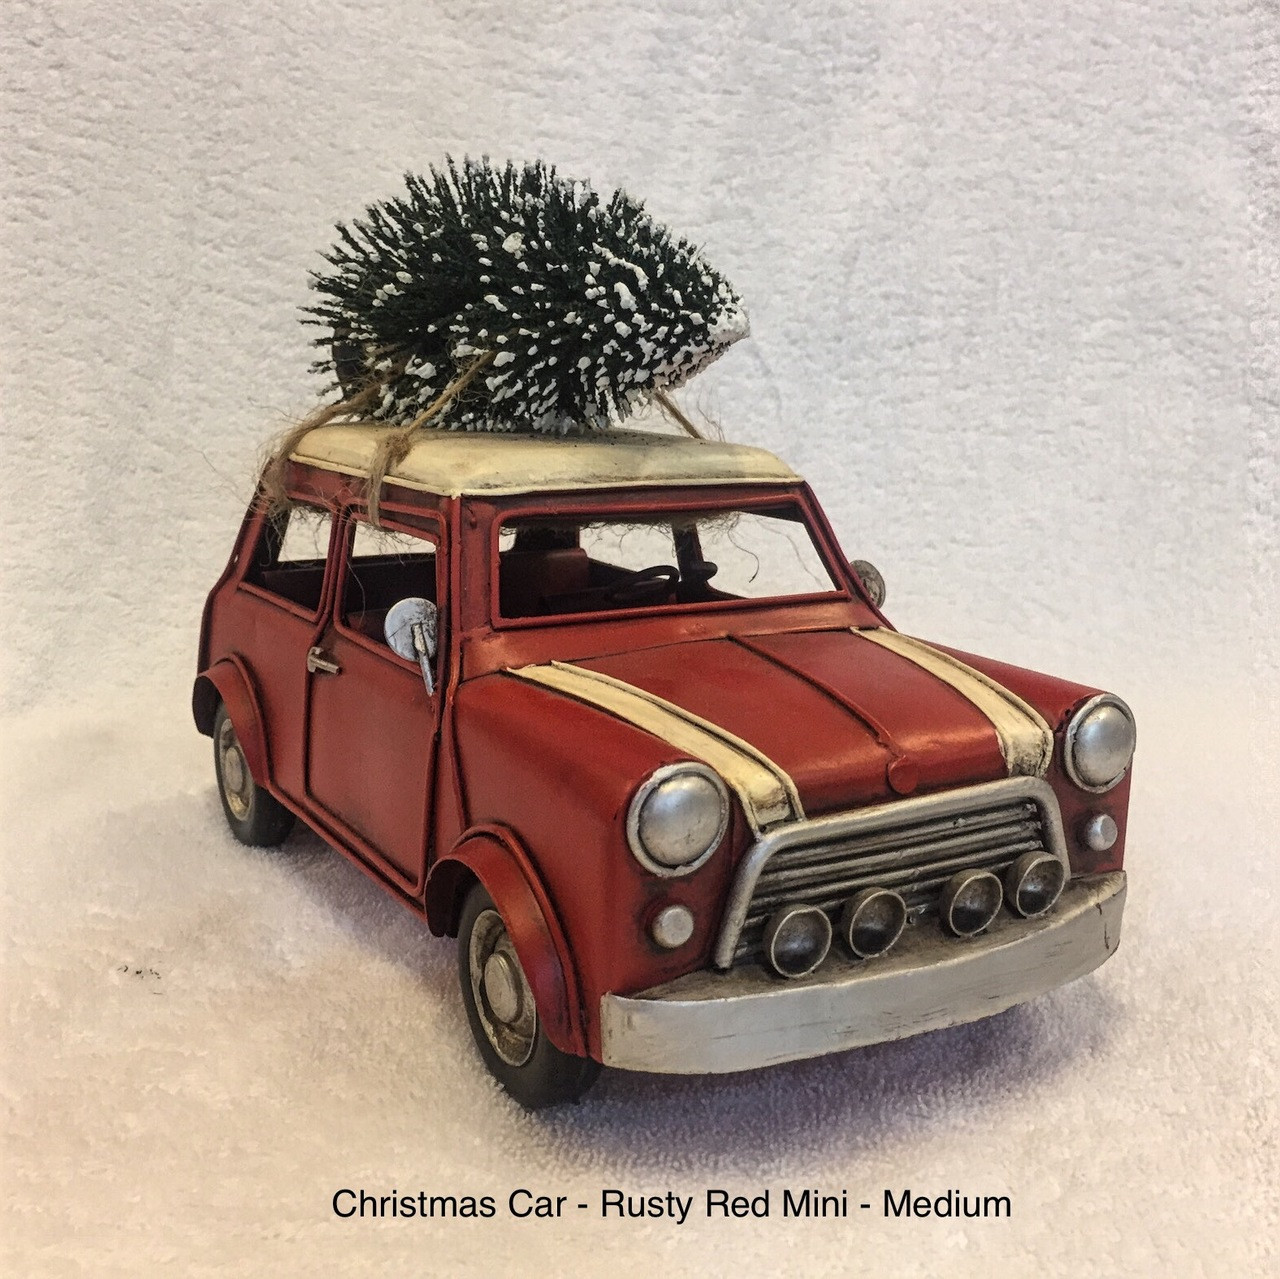 CHRISTMAS CAR - RUSTY RED MINI - LARGE Christmas Decoration